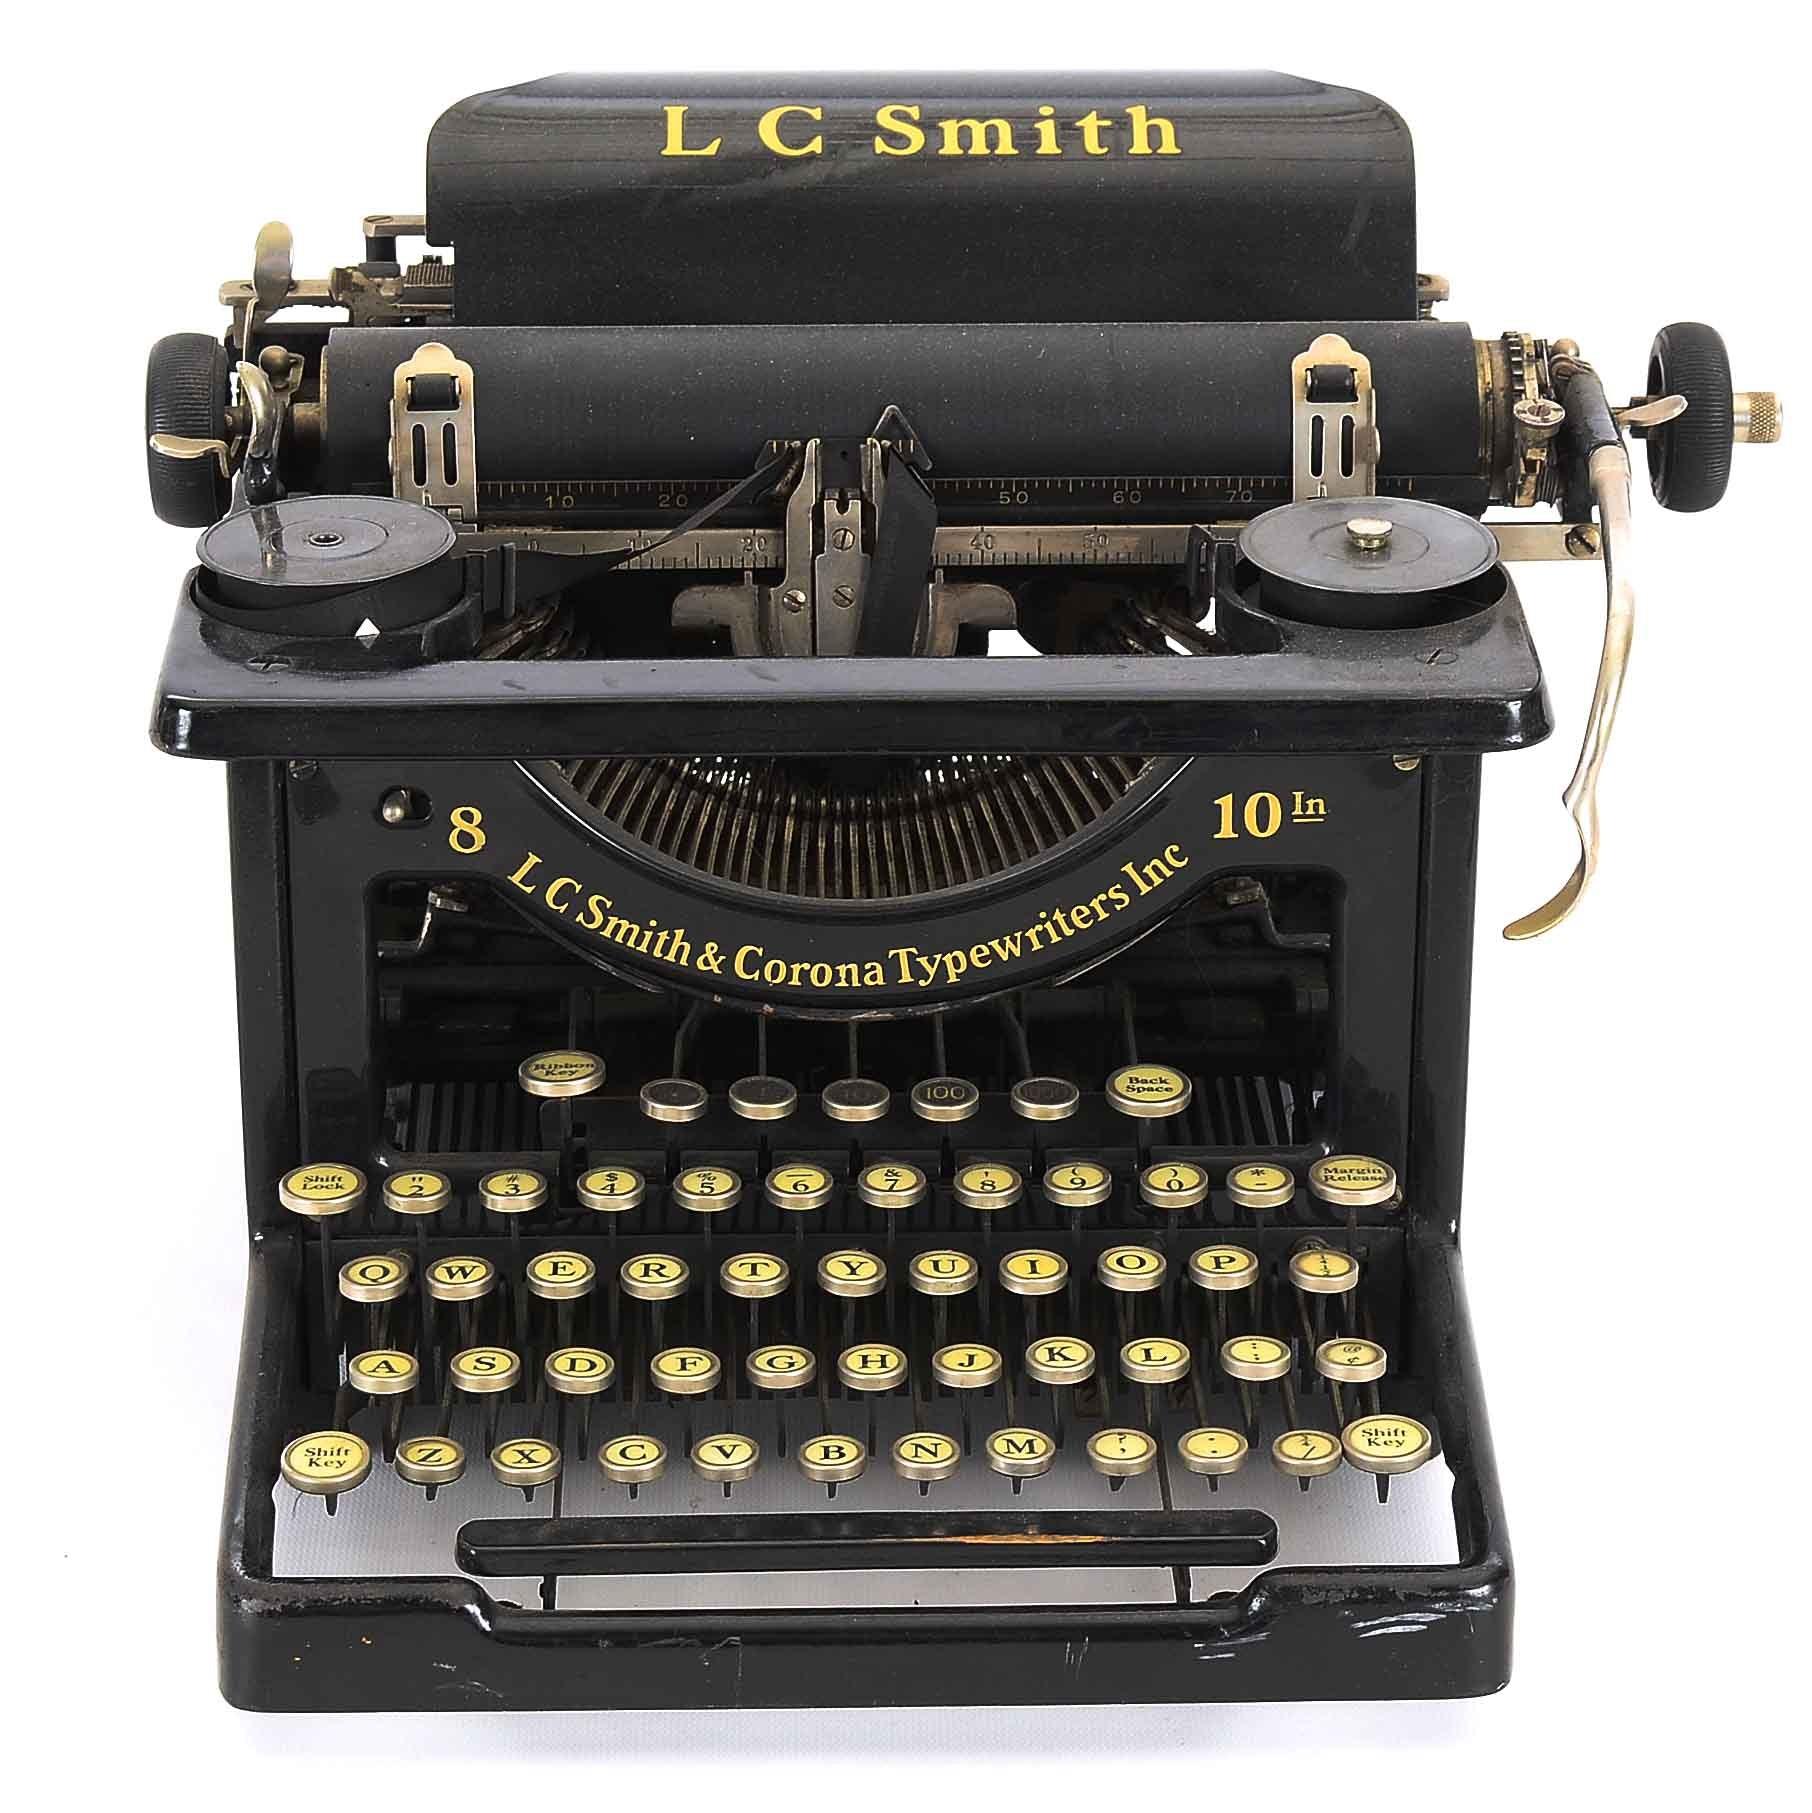 Antique LC Smith & Corona Typewriter